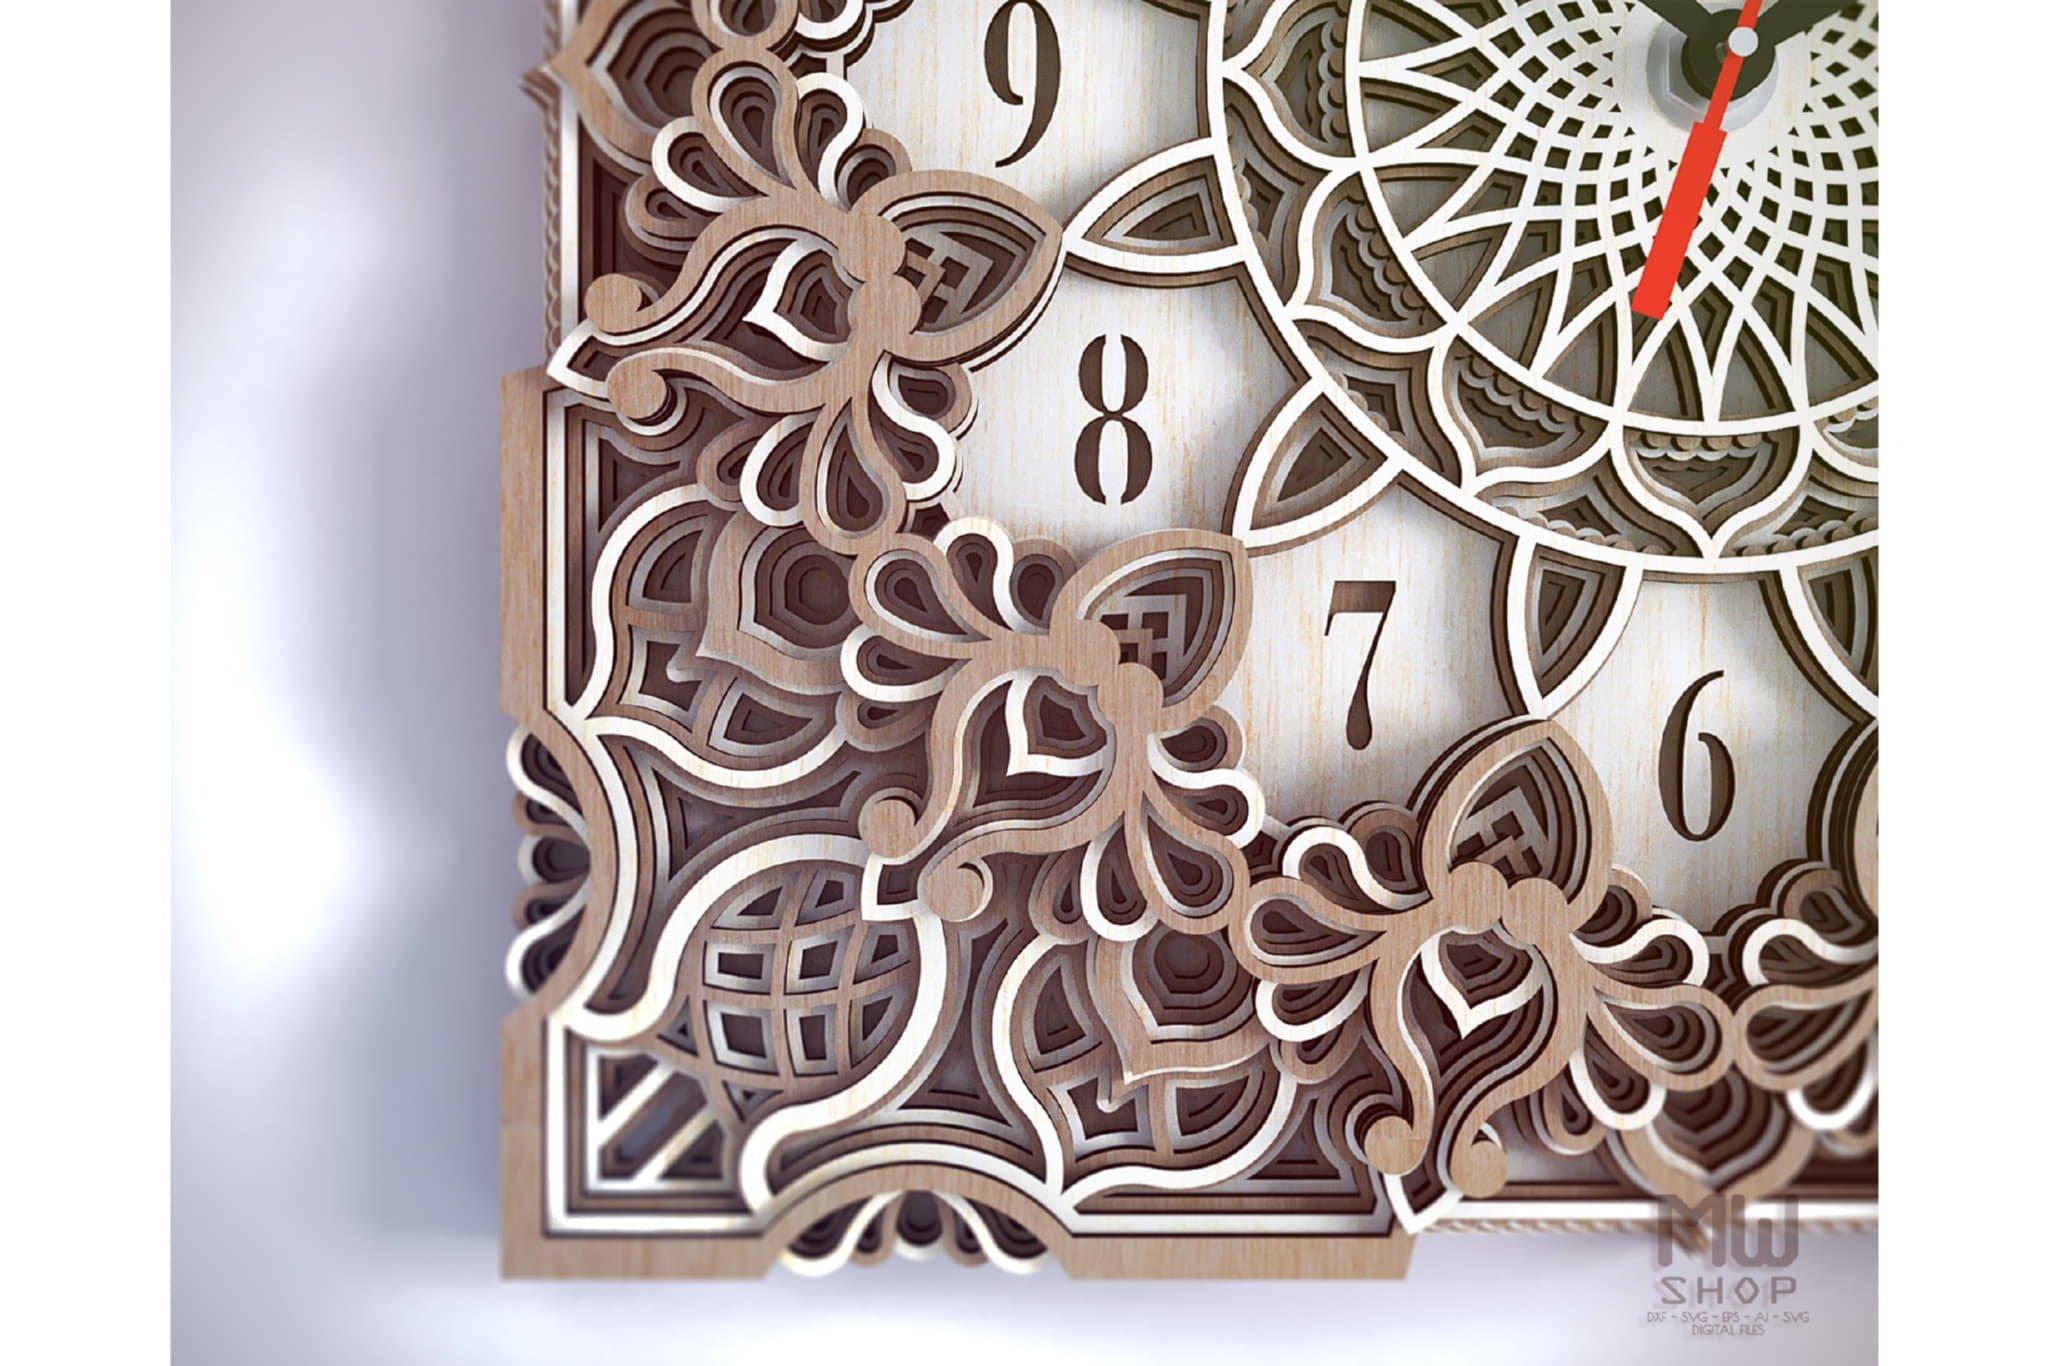 C13 - Mandala Clock DXF for Laser cut, Sacred Clock SVG example image 6